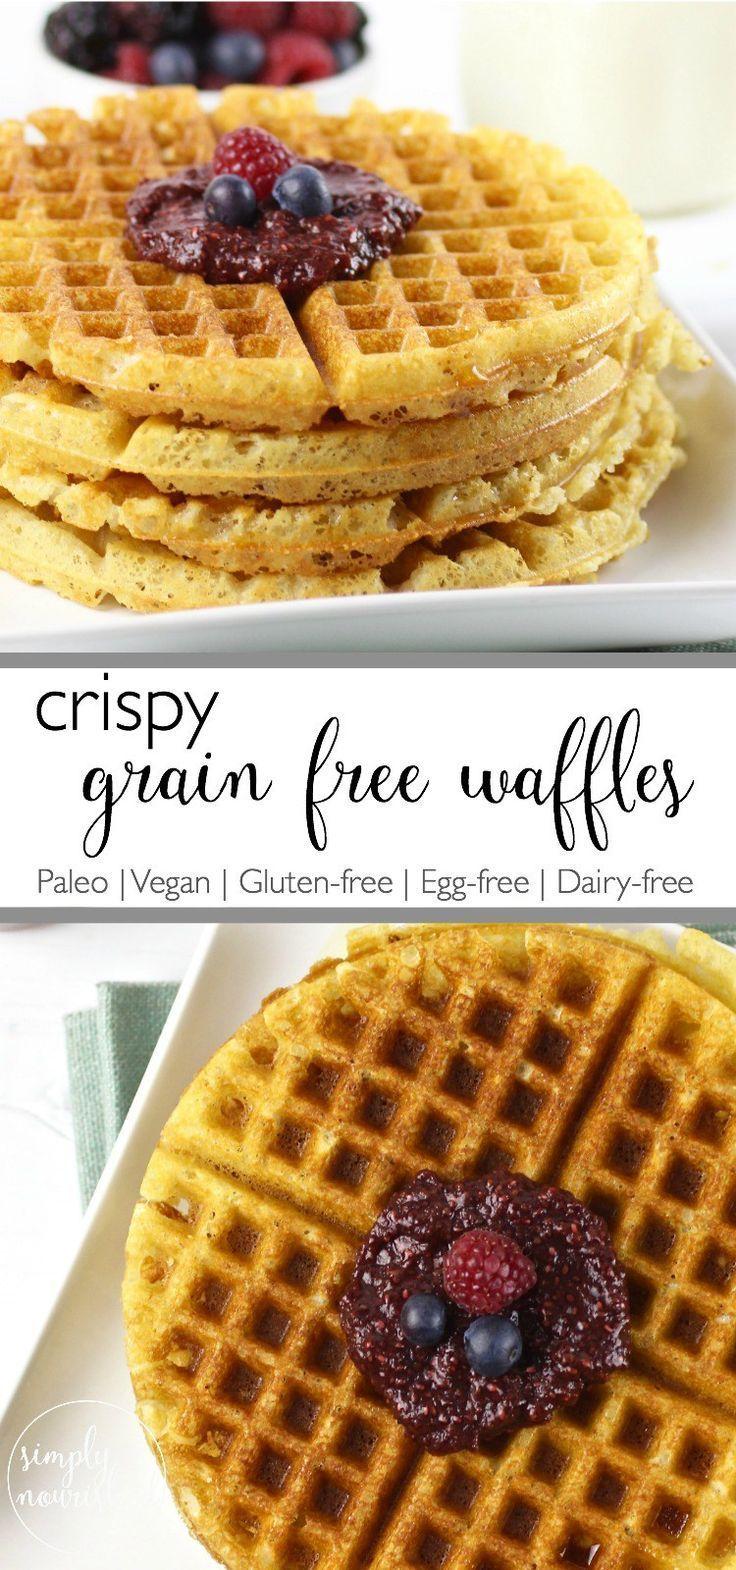 Crispy Grain-free Waffles | Paleo waffle recipe | Vegan vegan waffle recipe | Gluten-Free waffle recipe | egg-free waffle recipe | healthy waffle recipe | healthier breakfast recipes || The Real Food Dietitians #veganwaffles #healthywaffles #glutenfreebreakfast